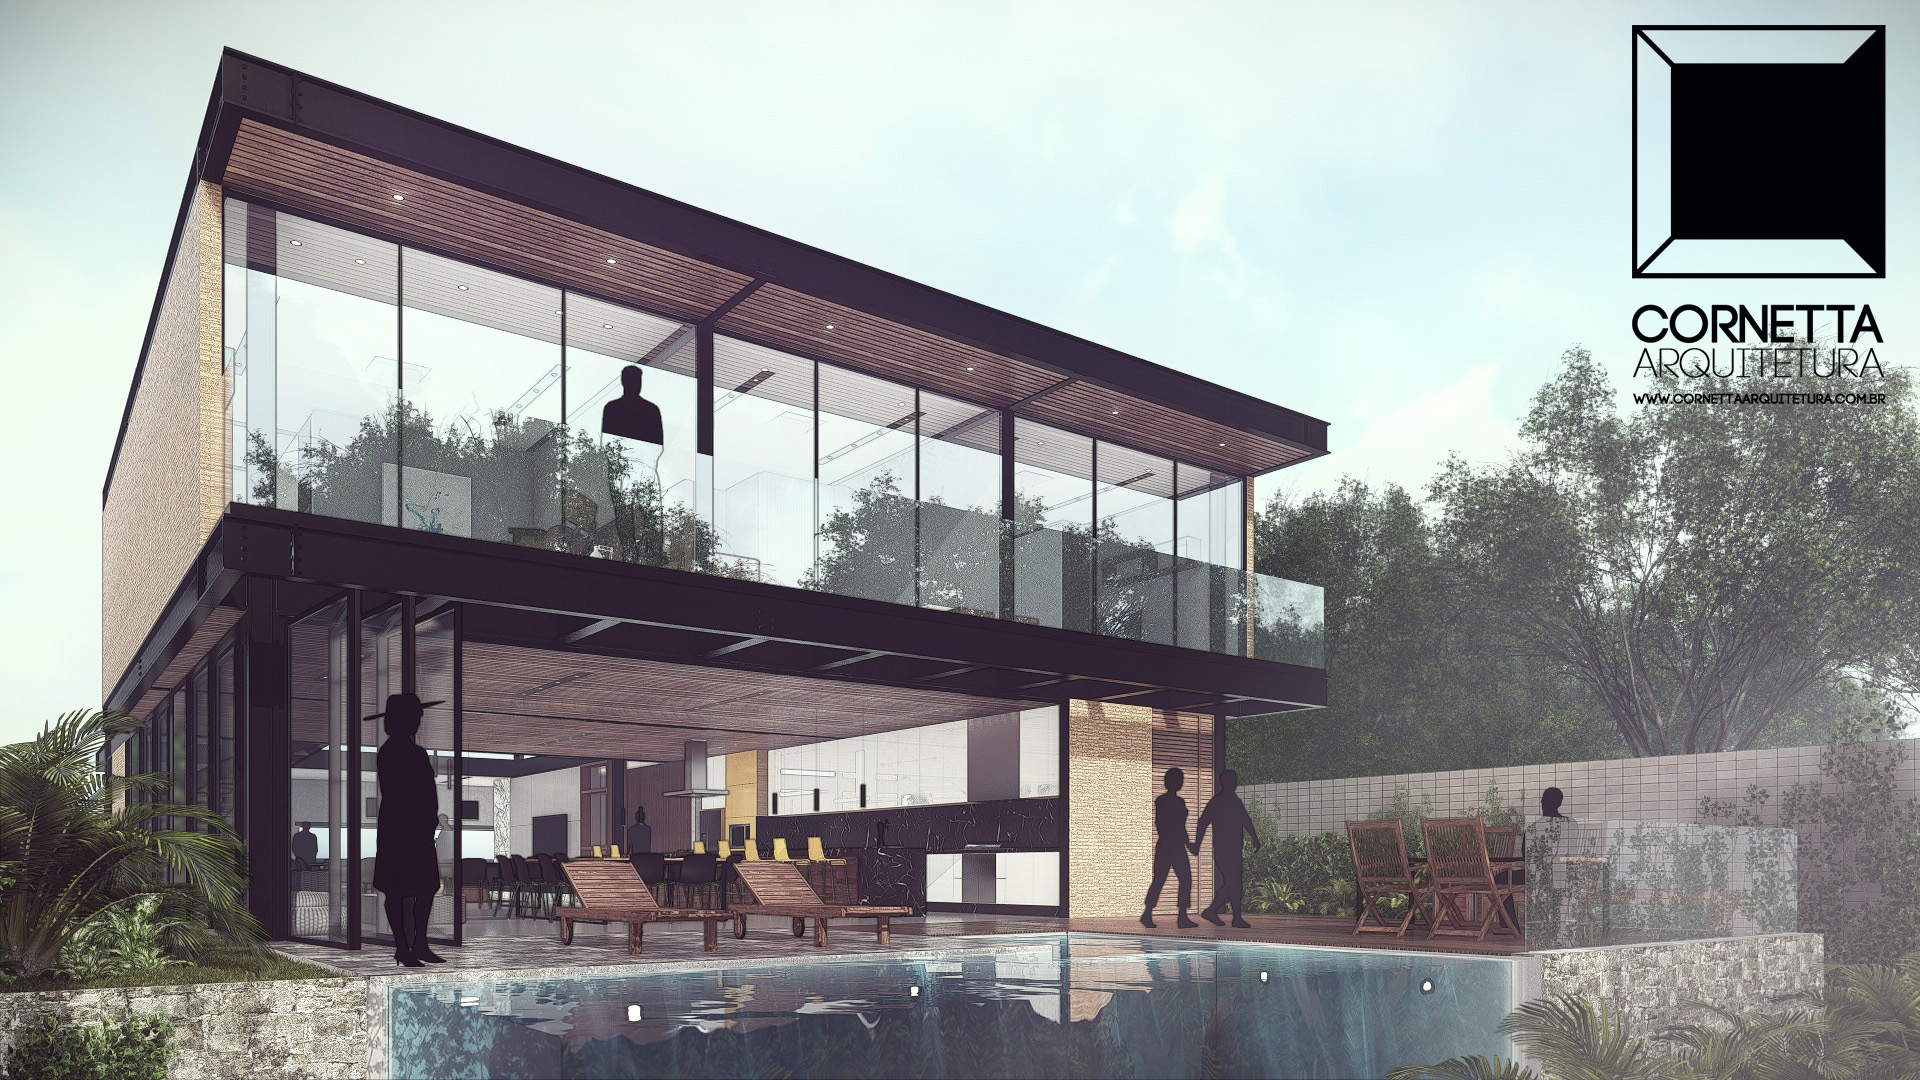 casas-estruturas-metalicas-a%C3%A7o-ecologicas-modernas-prefabricadas-industrial-vintage.jpg